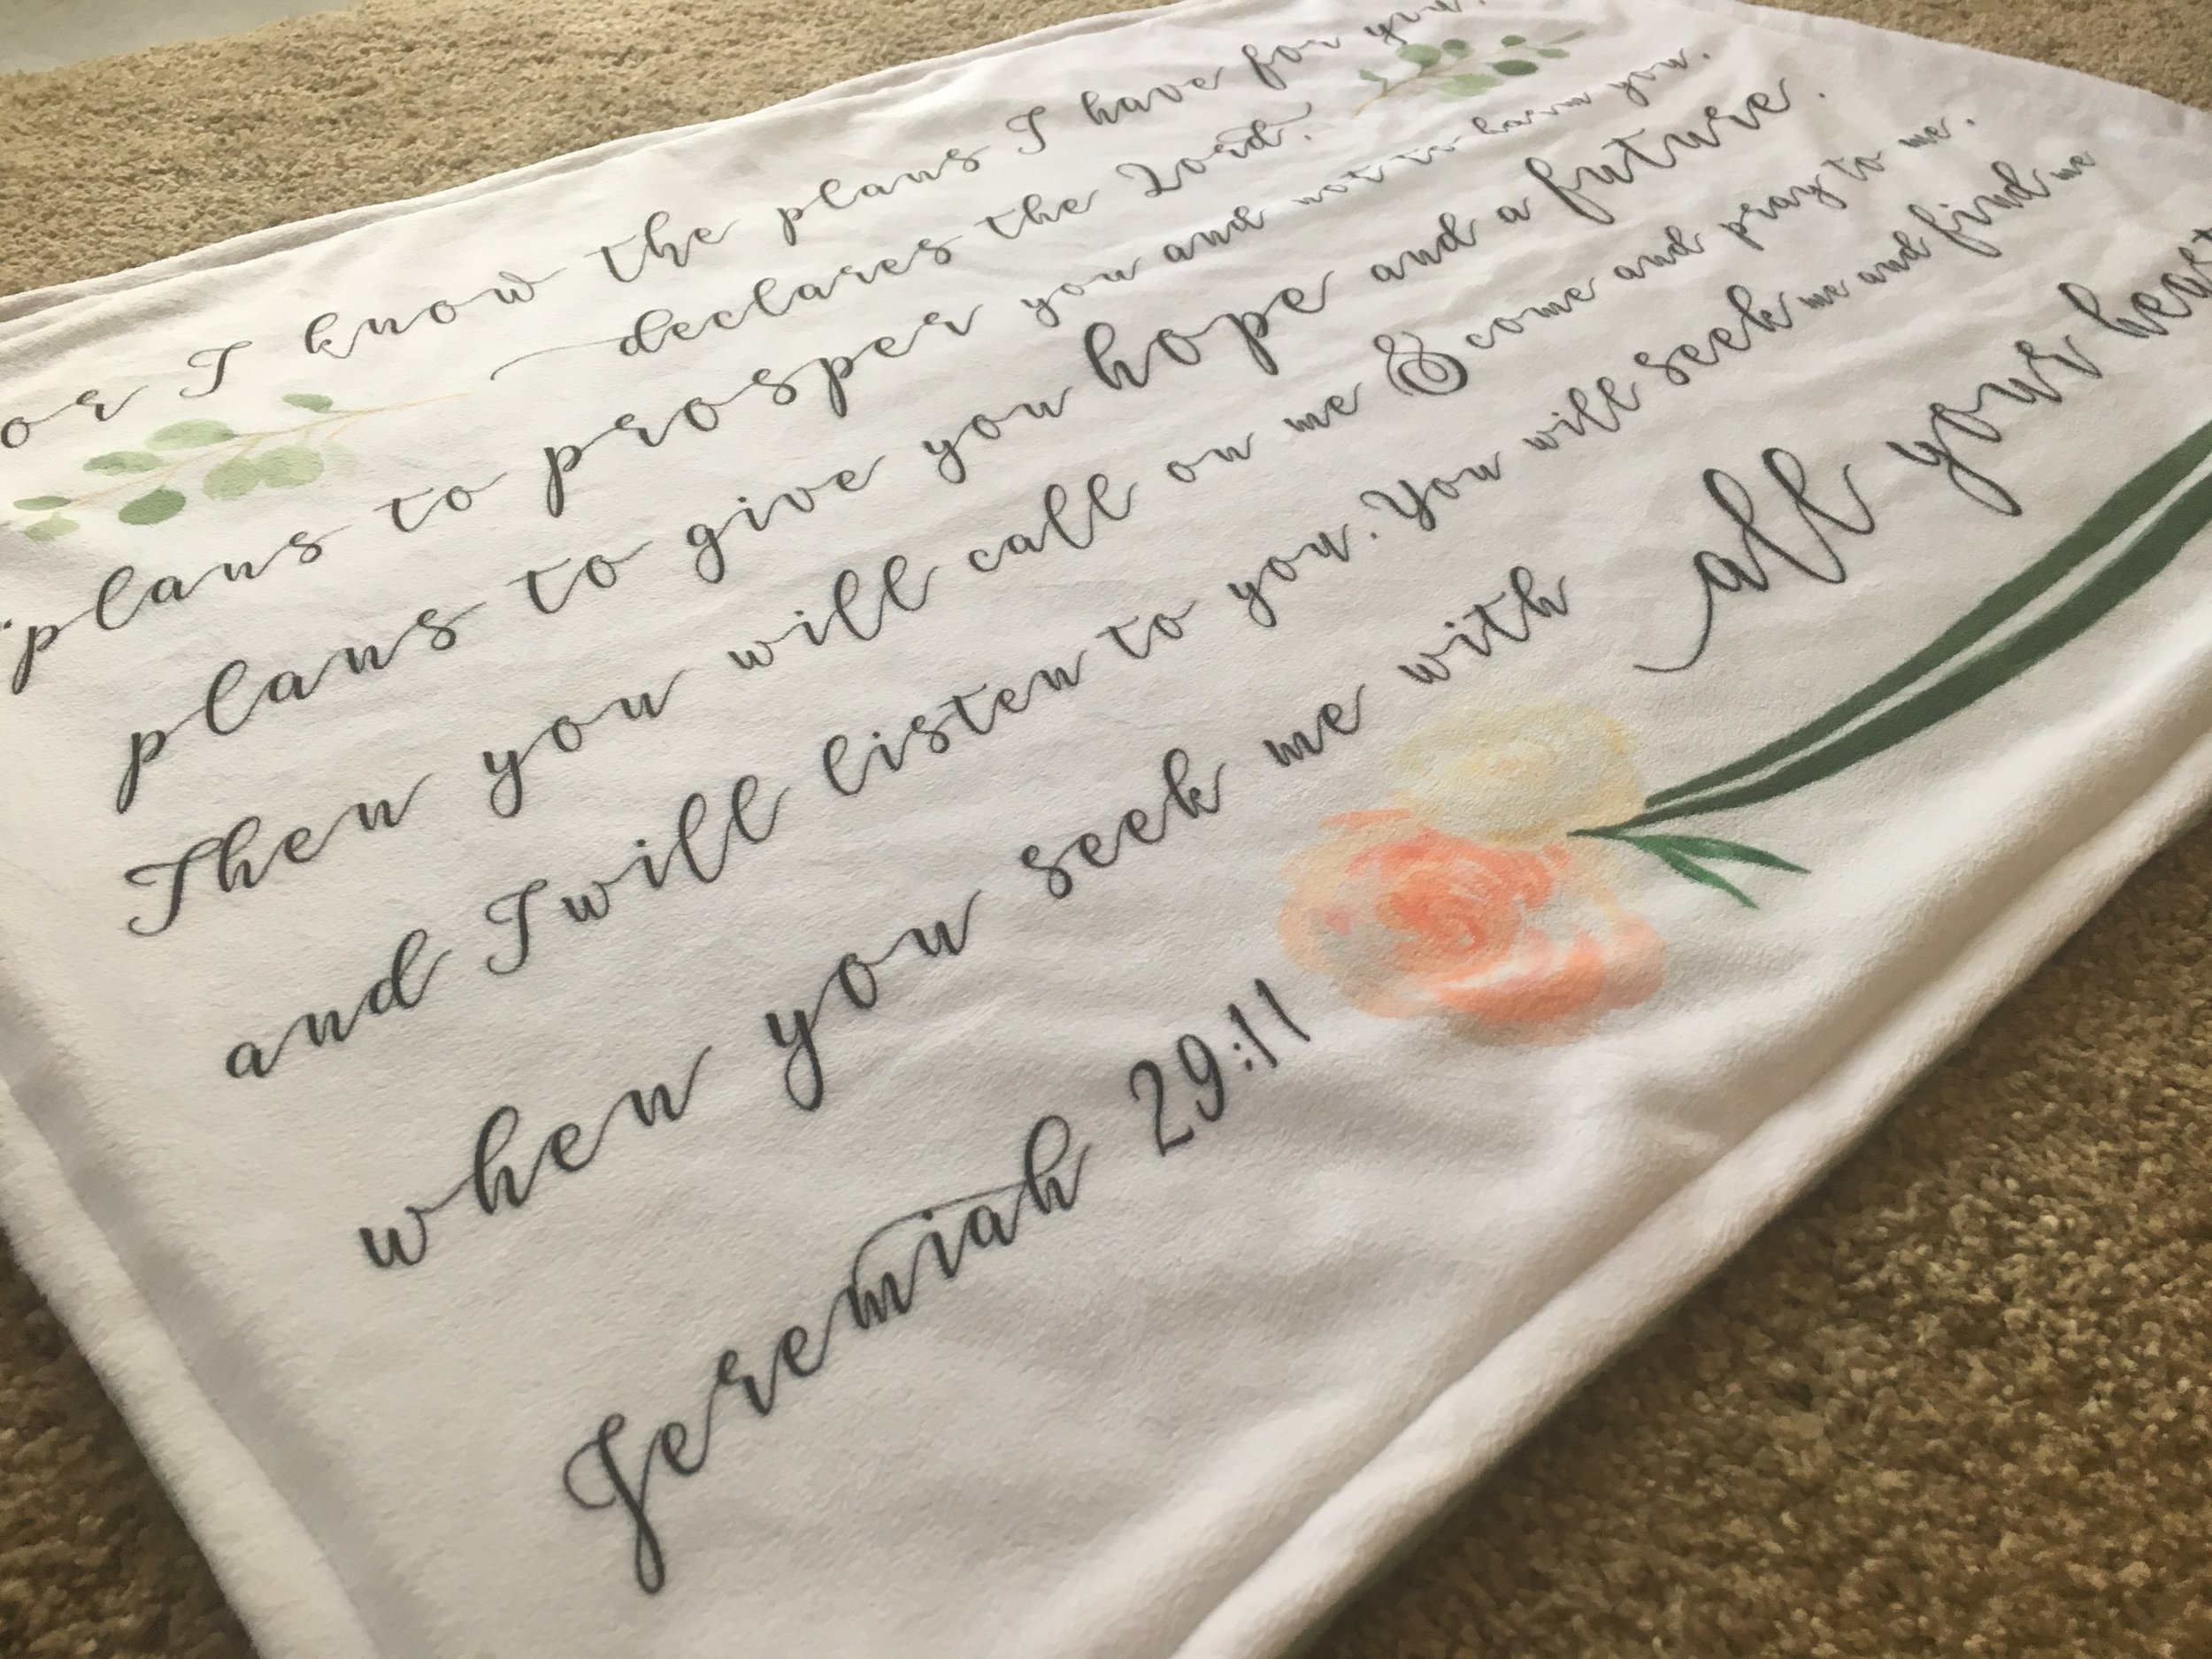 Central PA, Baby Blanket, Hand lettered, JesSmith Designs, Invitations, custom-04-21 16.57.11.jpg